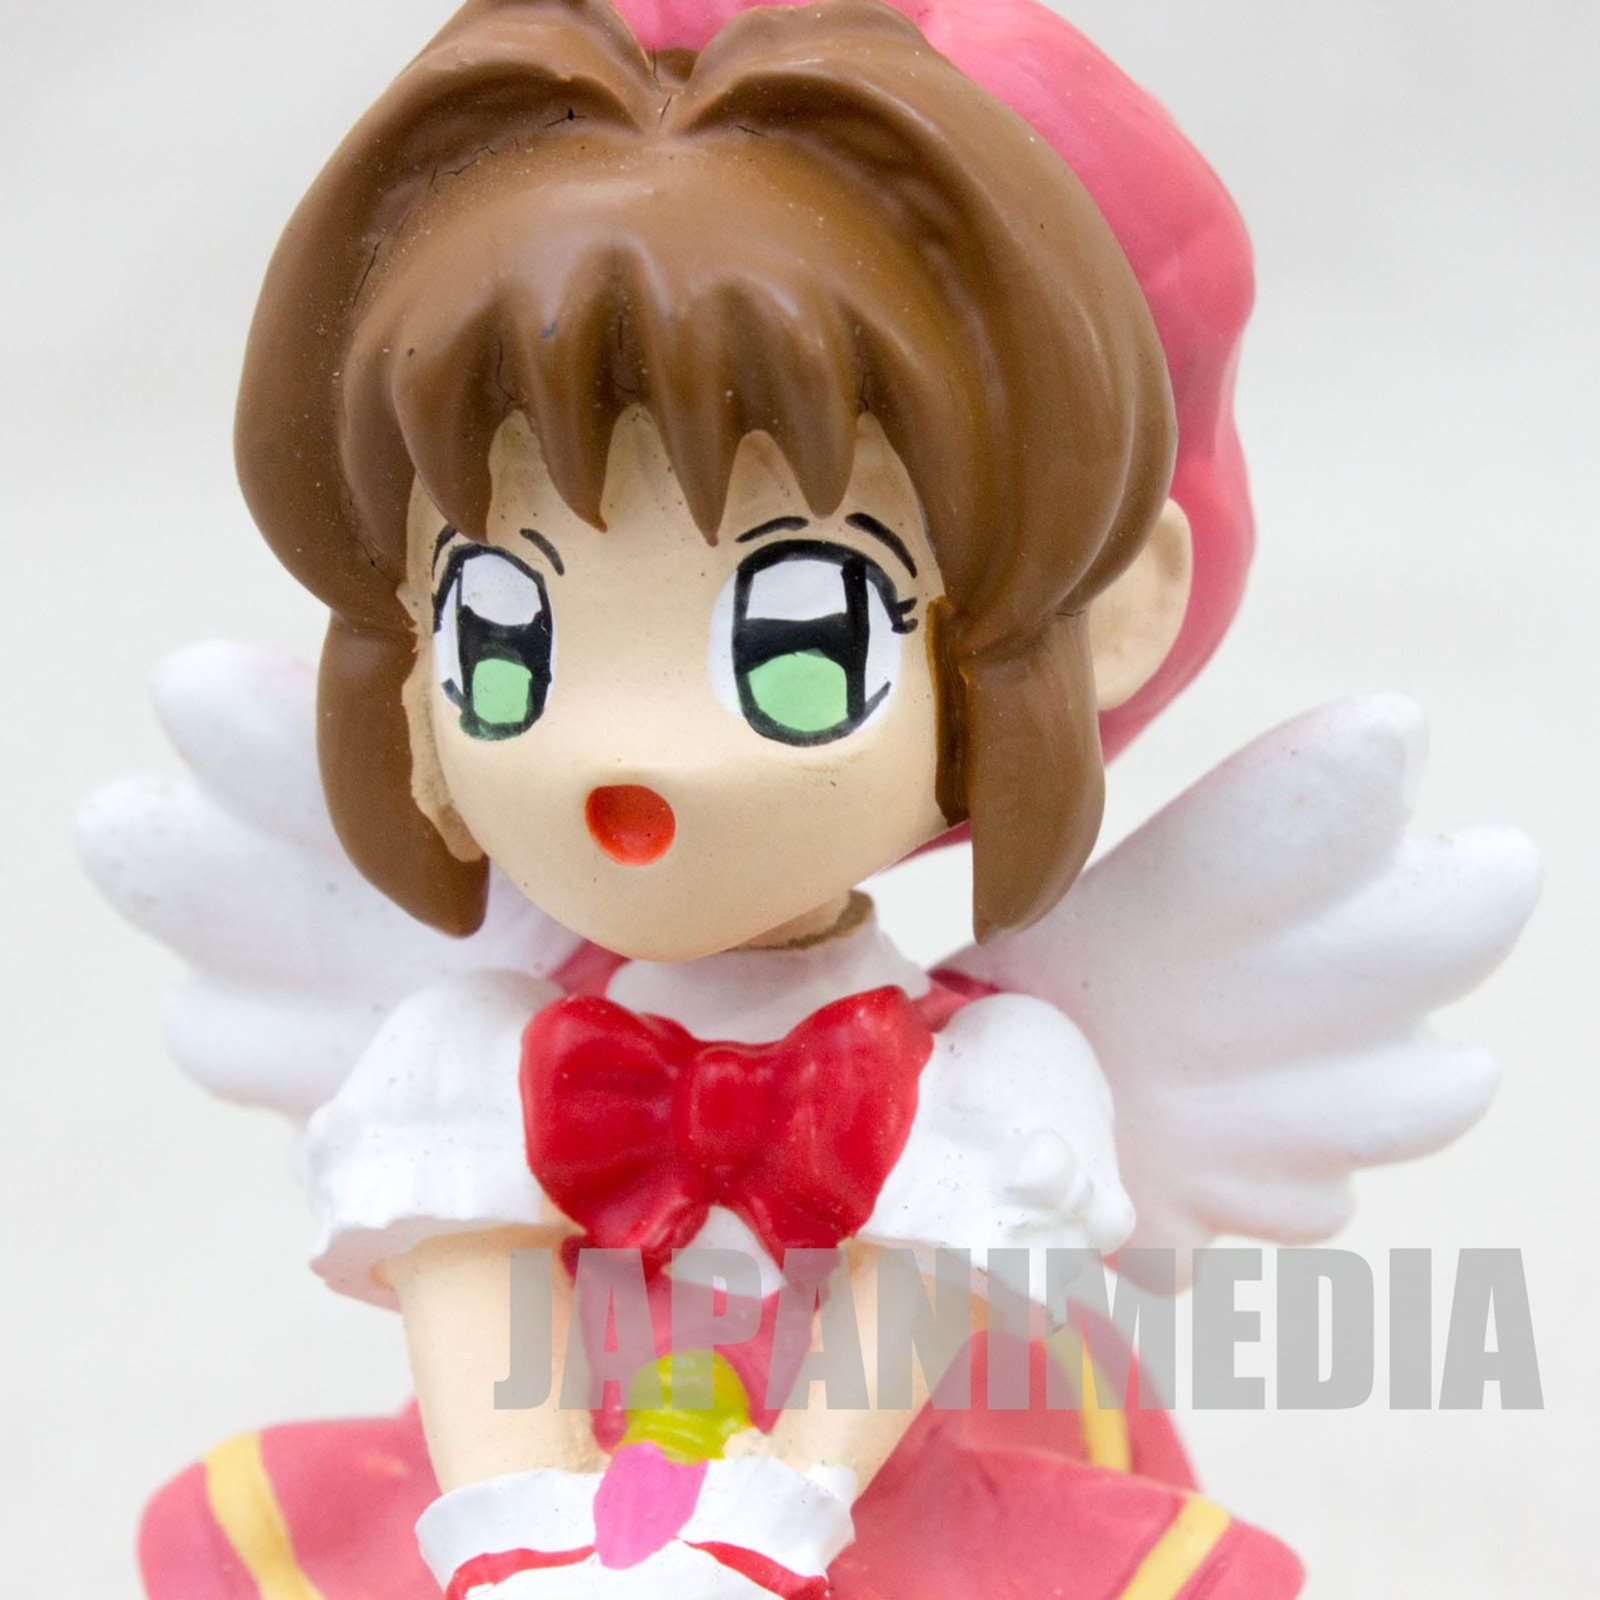 Cardcaptor Sakura Polystone Figure Battle Uniform Ver. JAPAN ANIME MANGA CLAMP